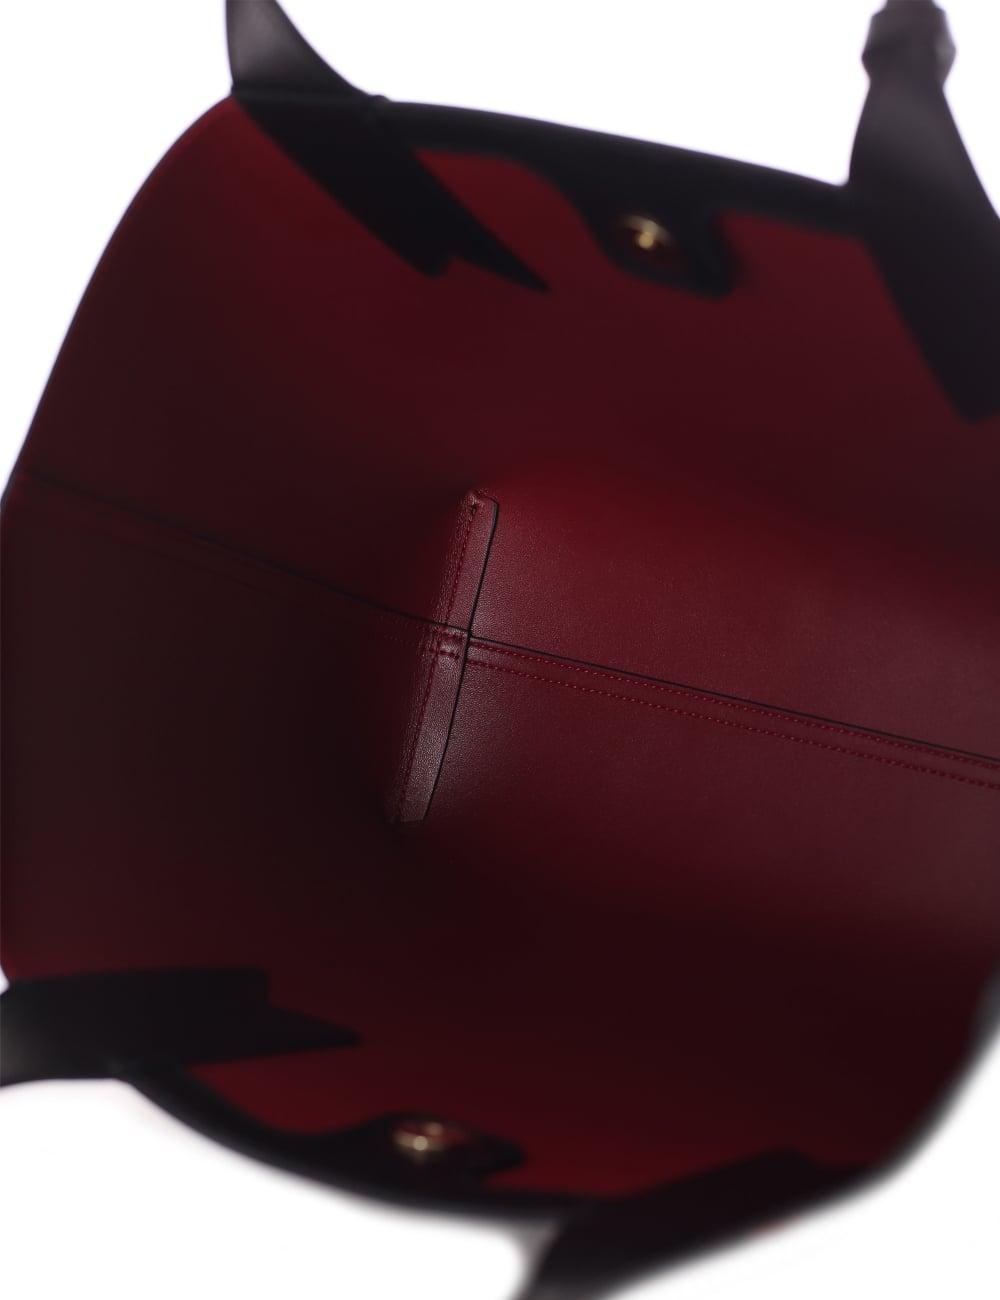 85c8f8116d Emporio Armani Borsa Women s Large Shopping Bag